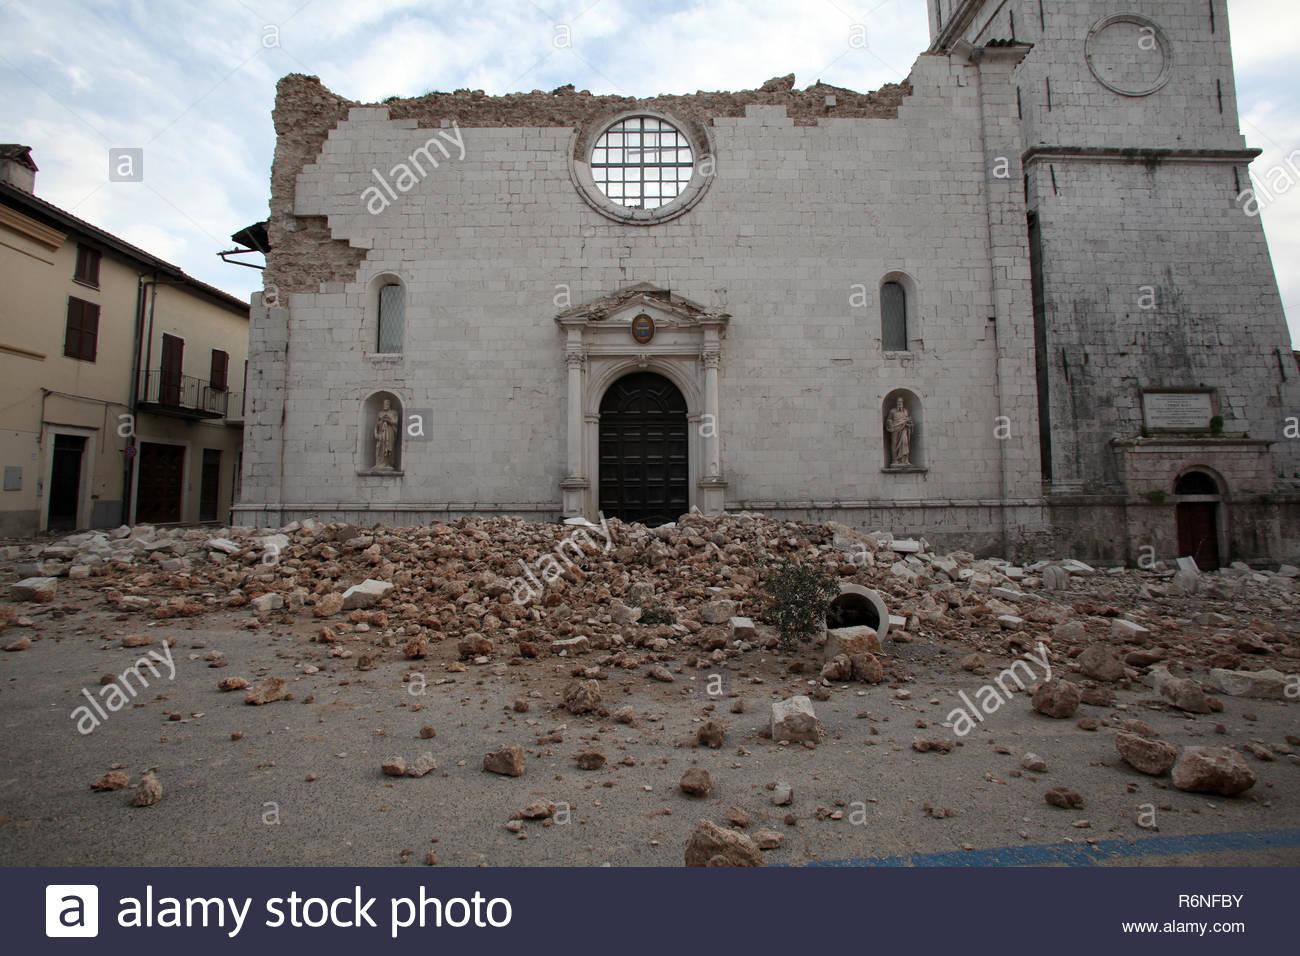 santa maria argentea, norcia historic center destroyed by the earthquake, 8-11-2016 Stock Photo